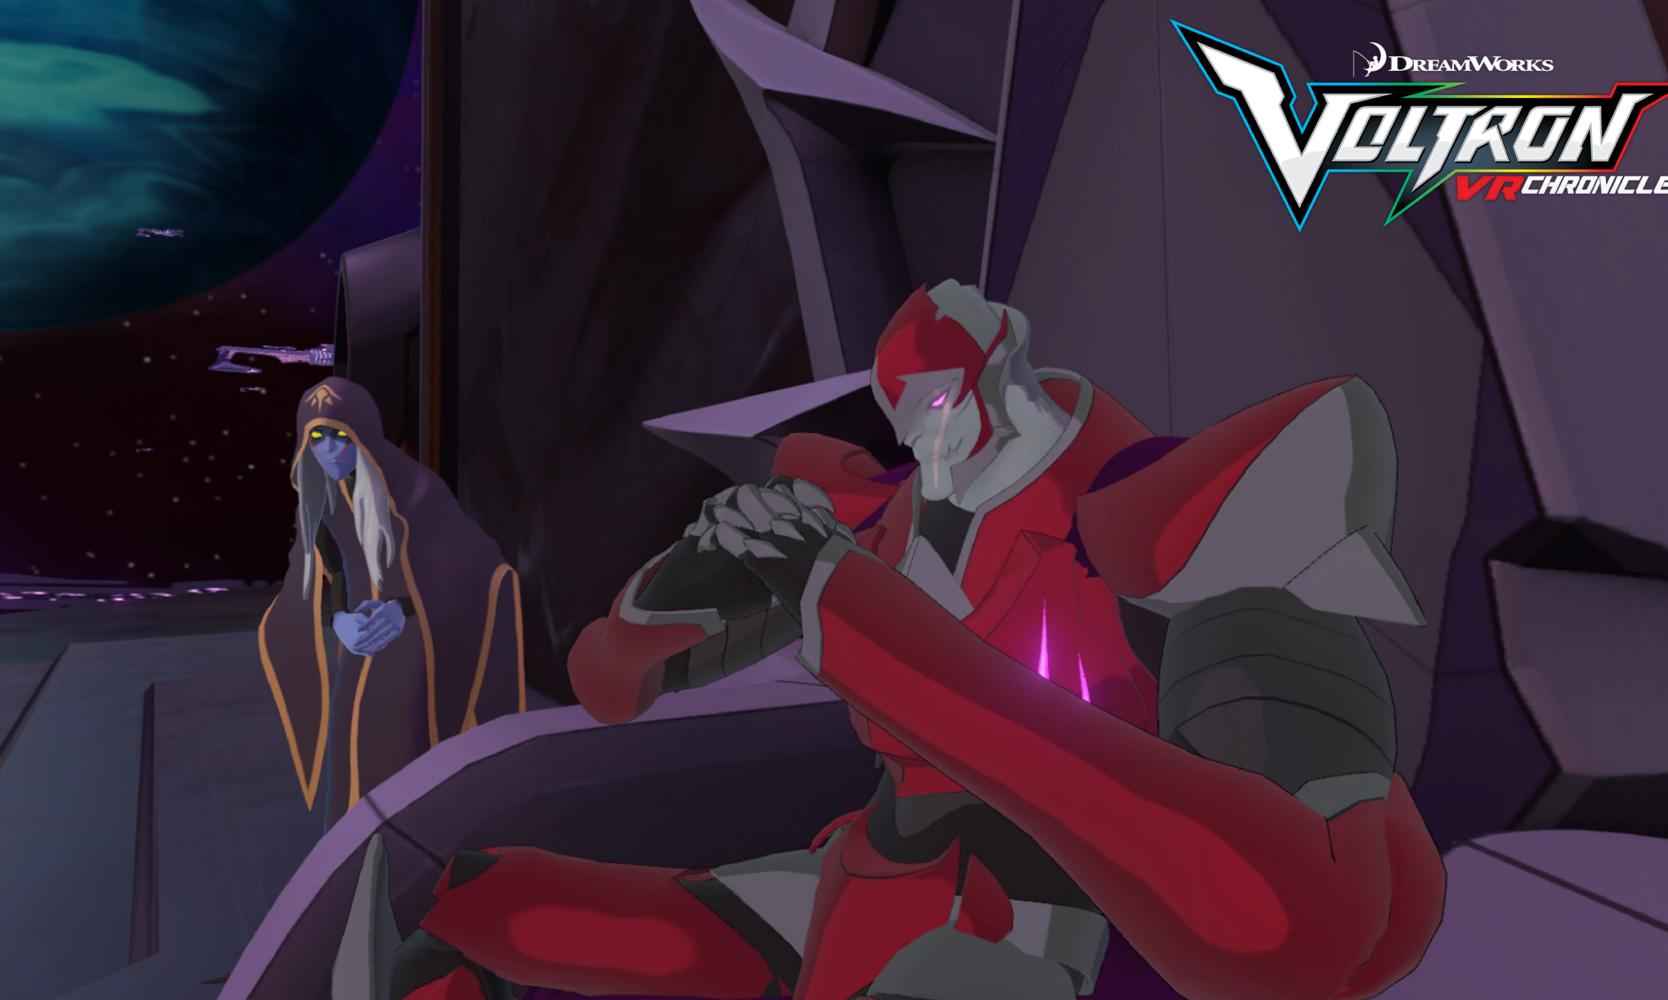 Voltron VR screenshot 3